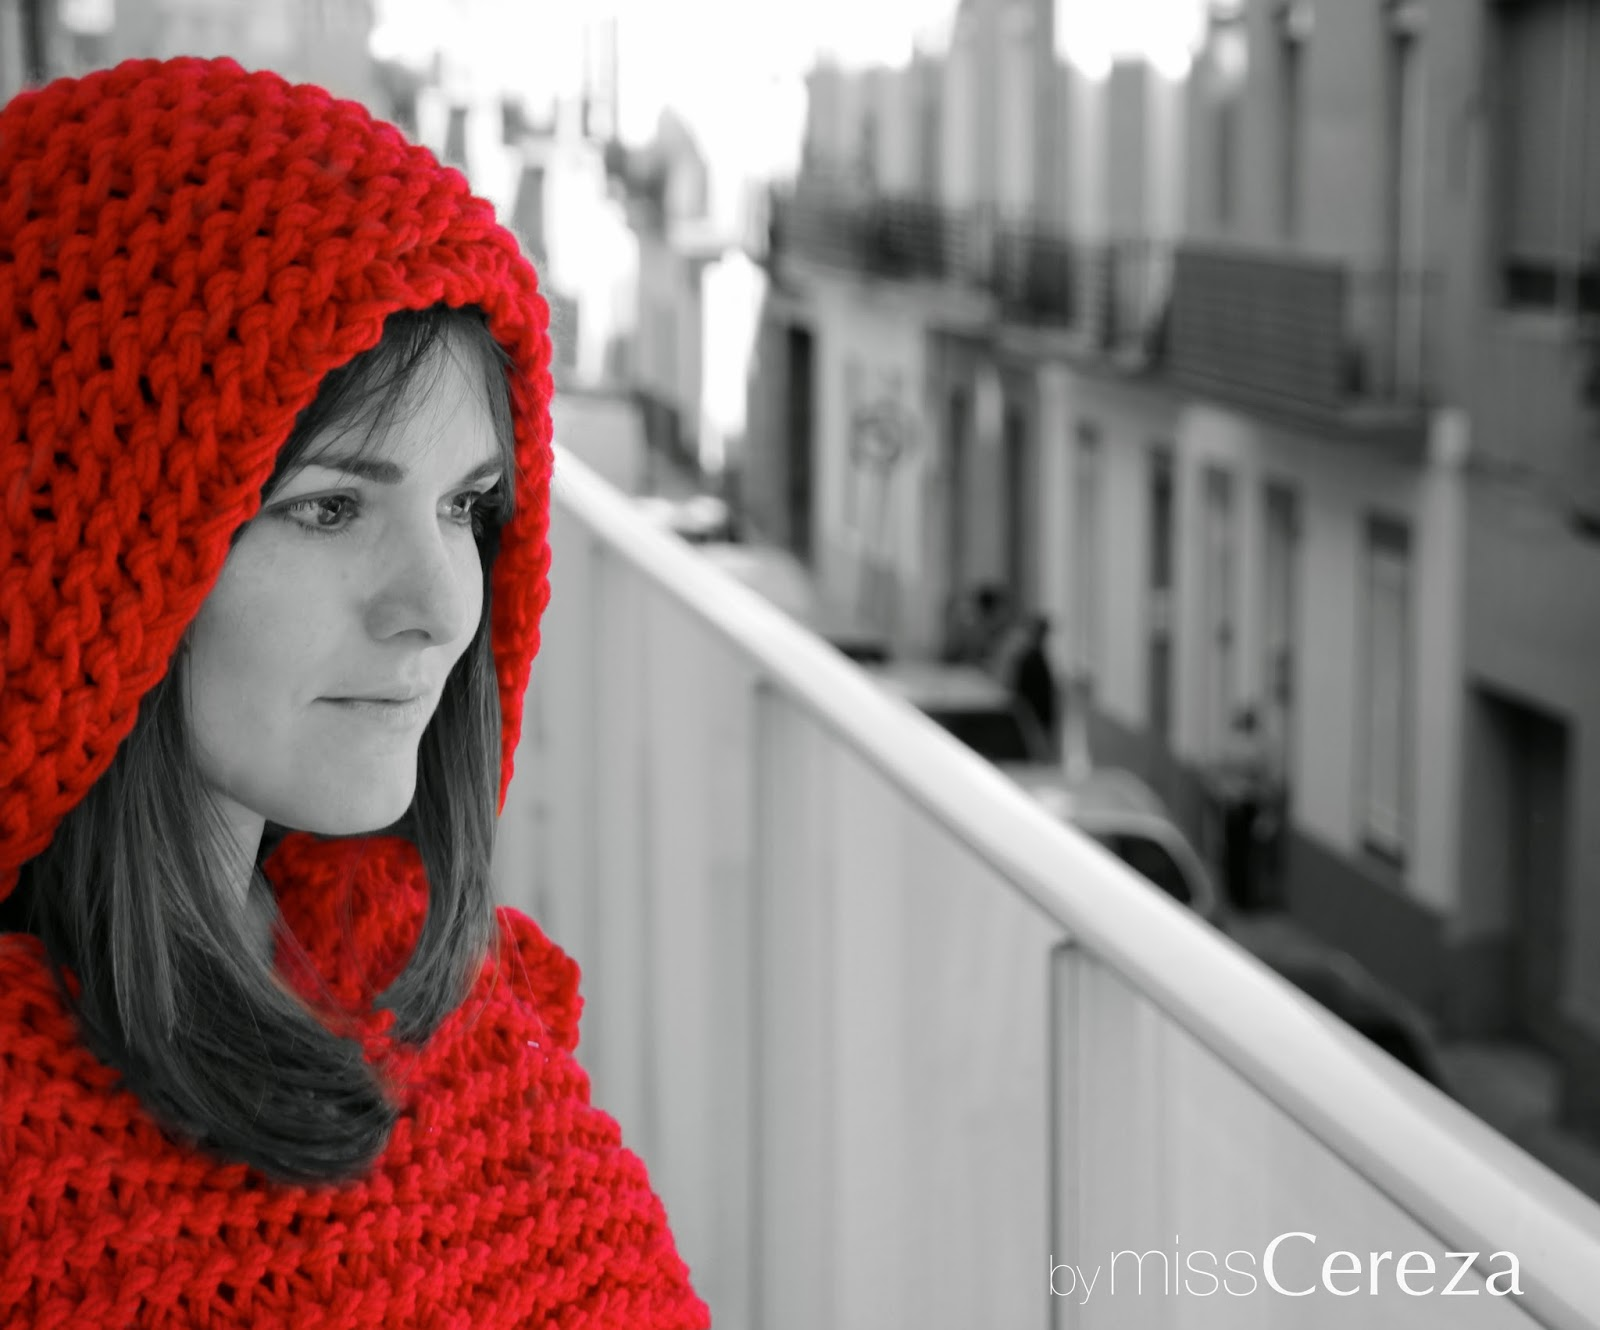 Capucha roja we are knitters